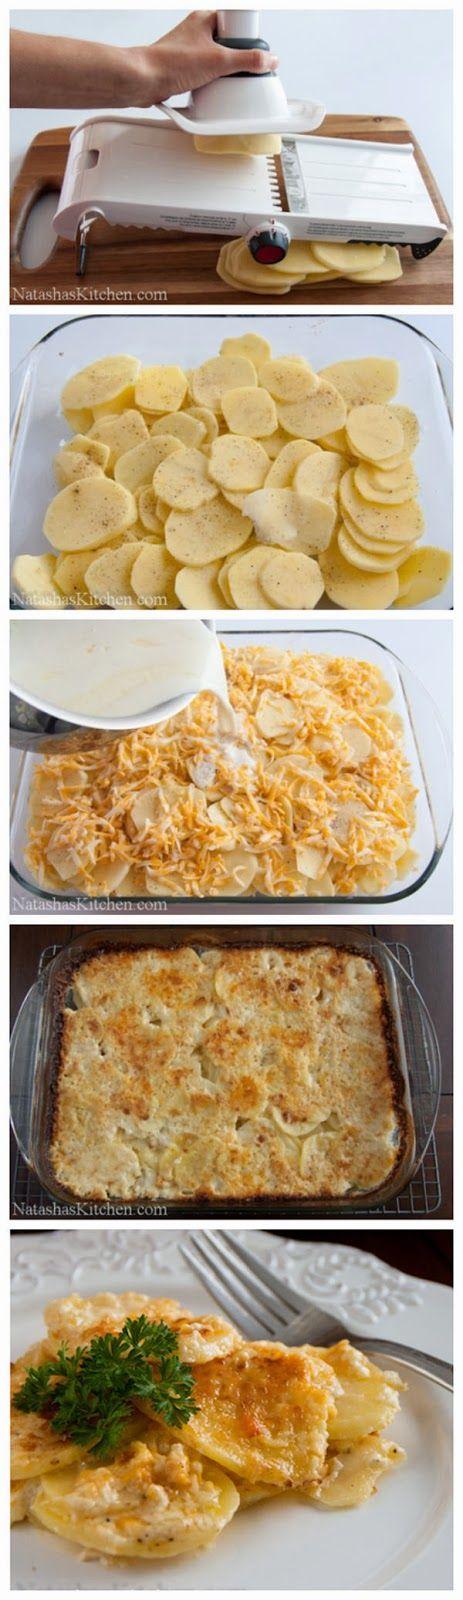 Scalloped Potatoes Recipe! Hey ma! Dinner @b Jacks another family fav o yea added qsome veelveta cheese